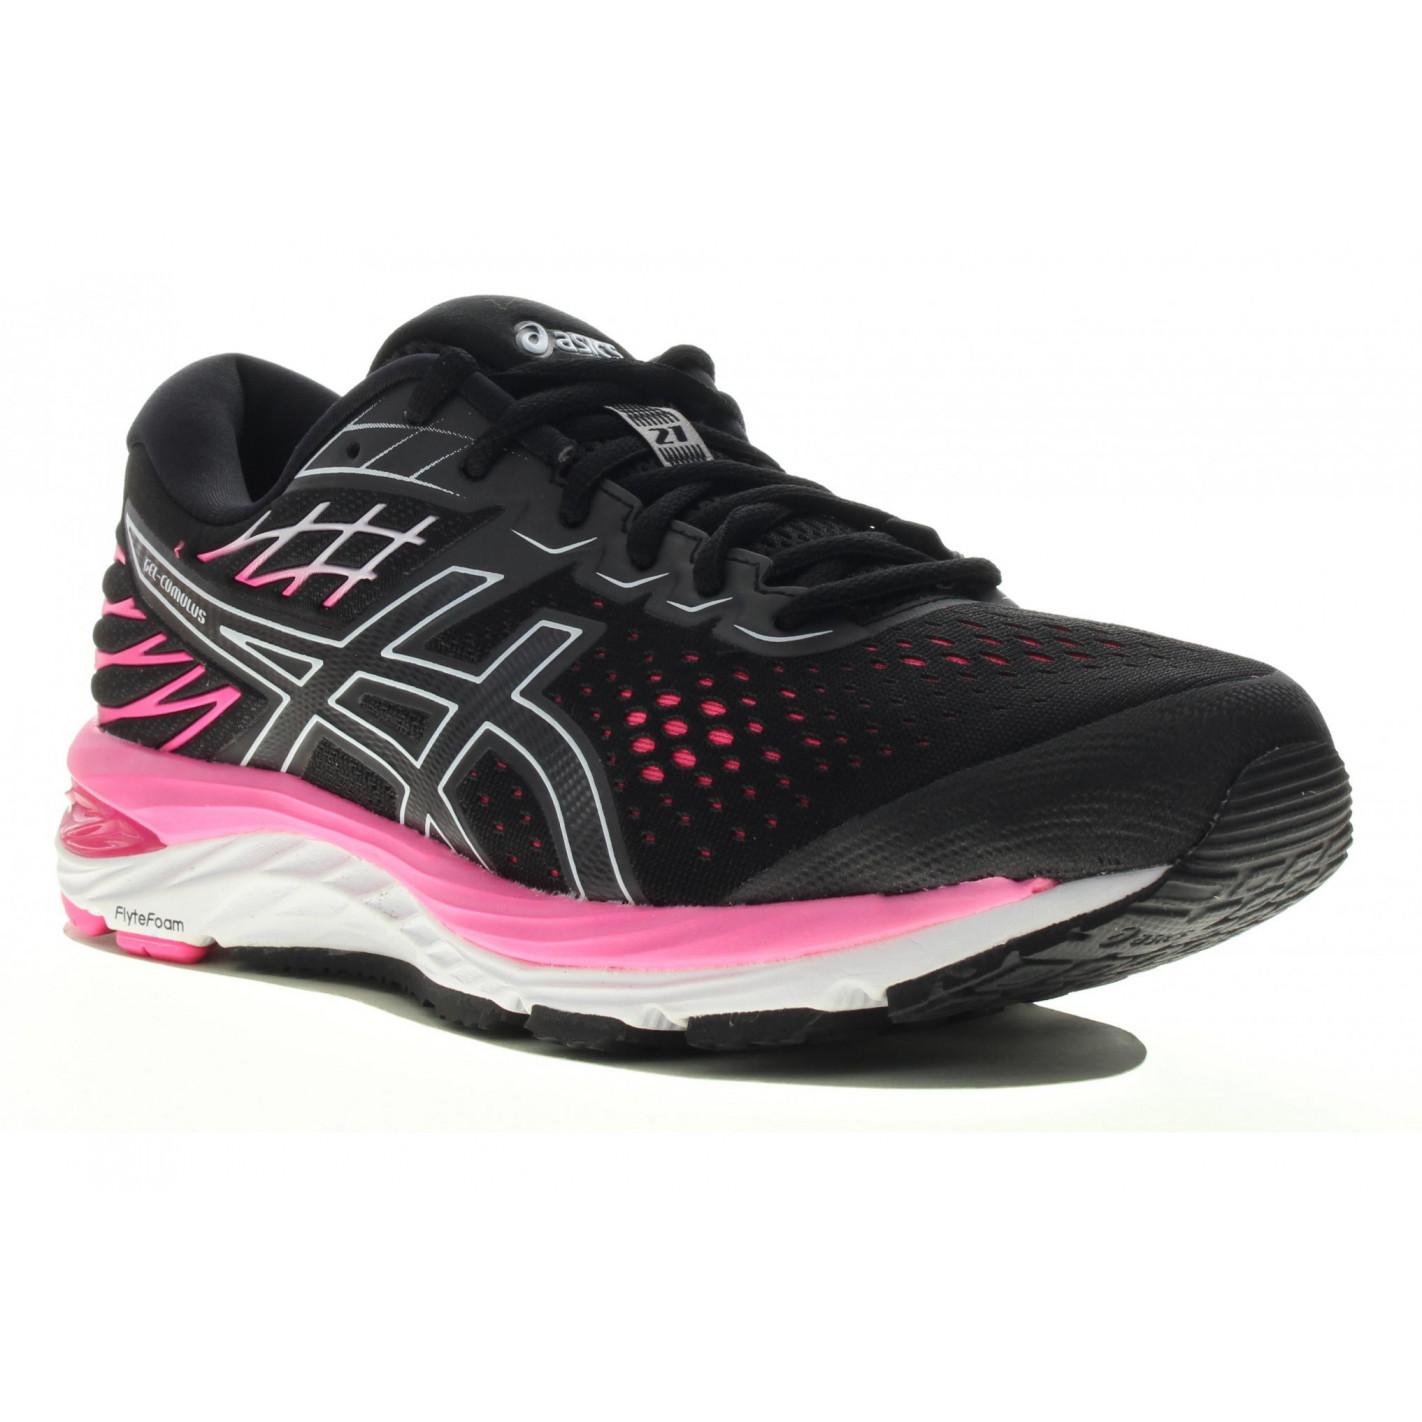 Chaussures Running ASICS Femme GEL-CUMULUS 21 Noir / Rose PE 2020 ...